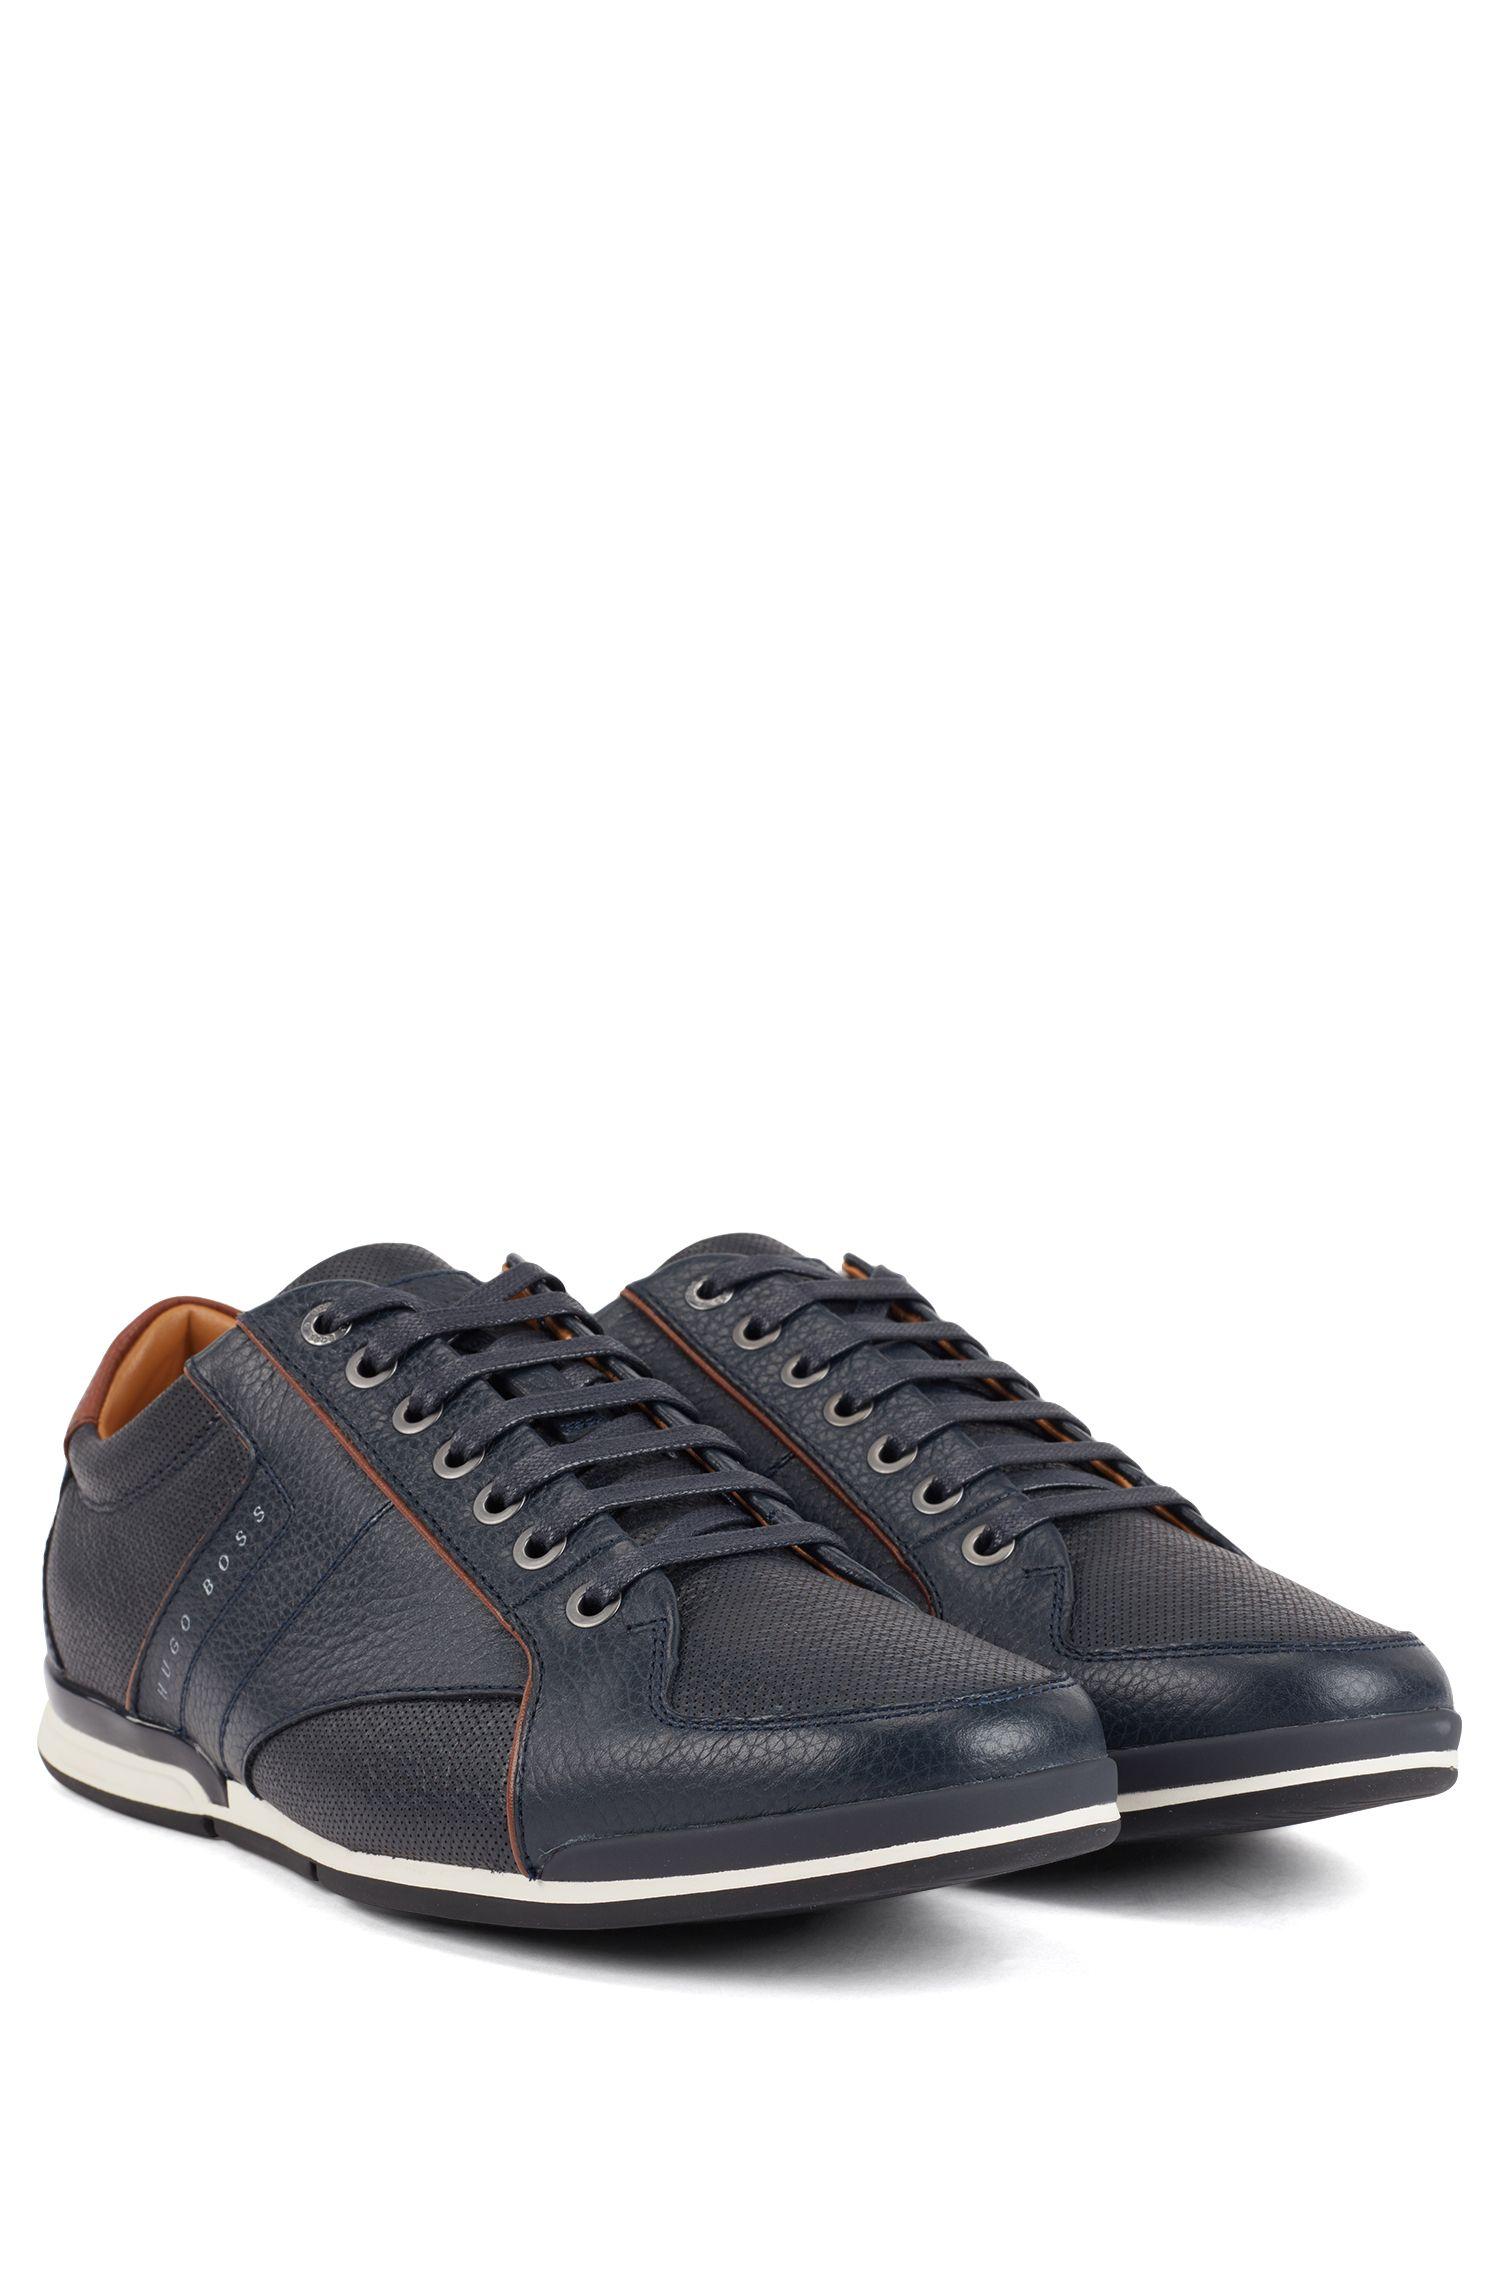 Lowtop Sneakers aus gegerbtem Leder mit Kontrast-Details, Dunkelblau